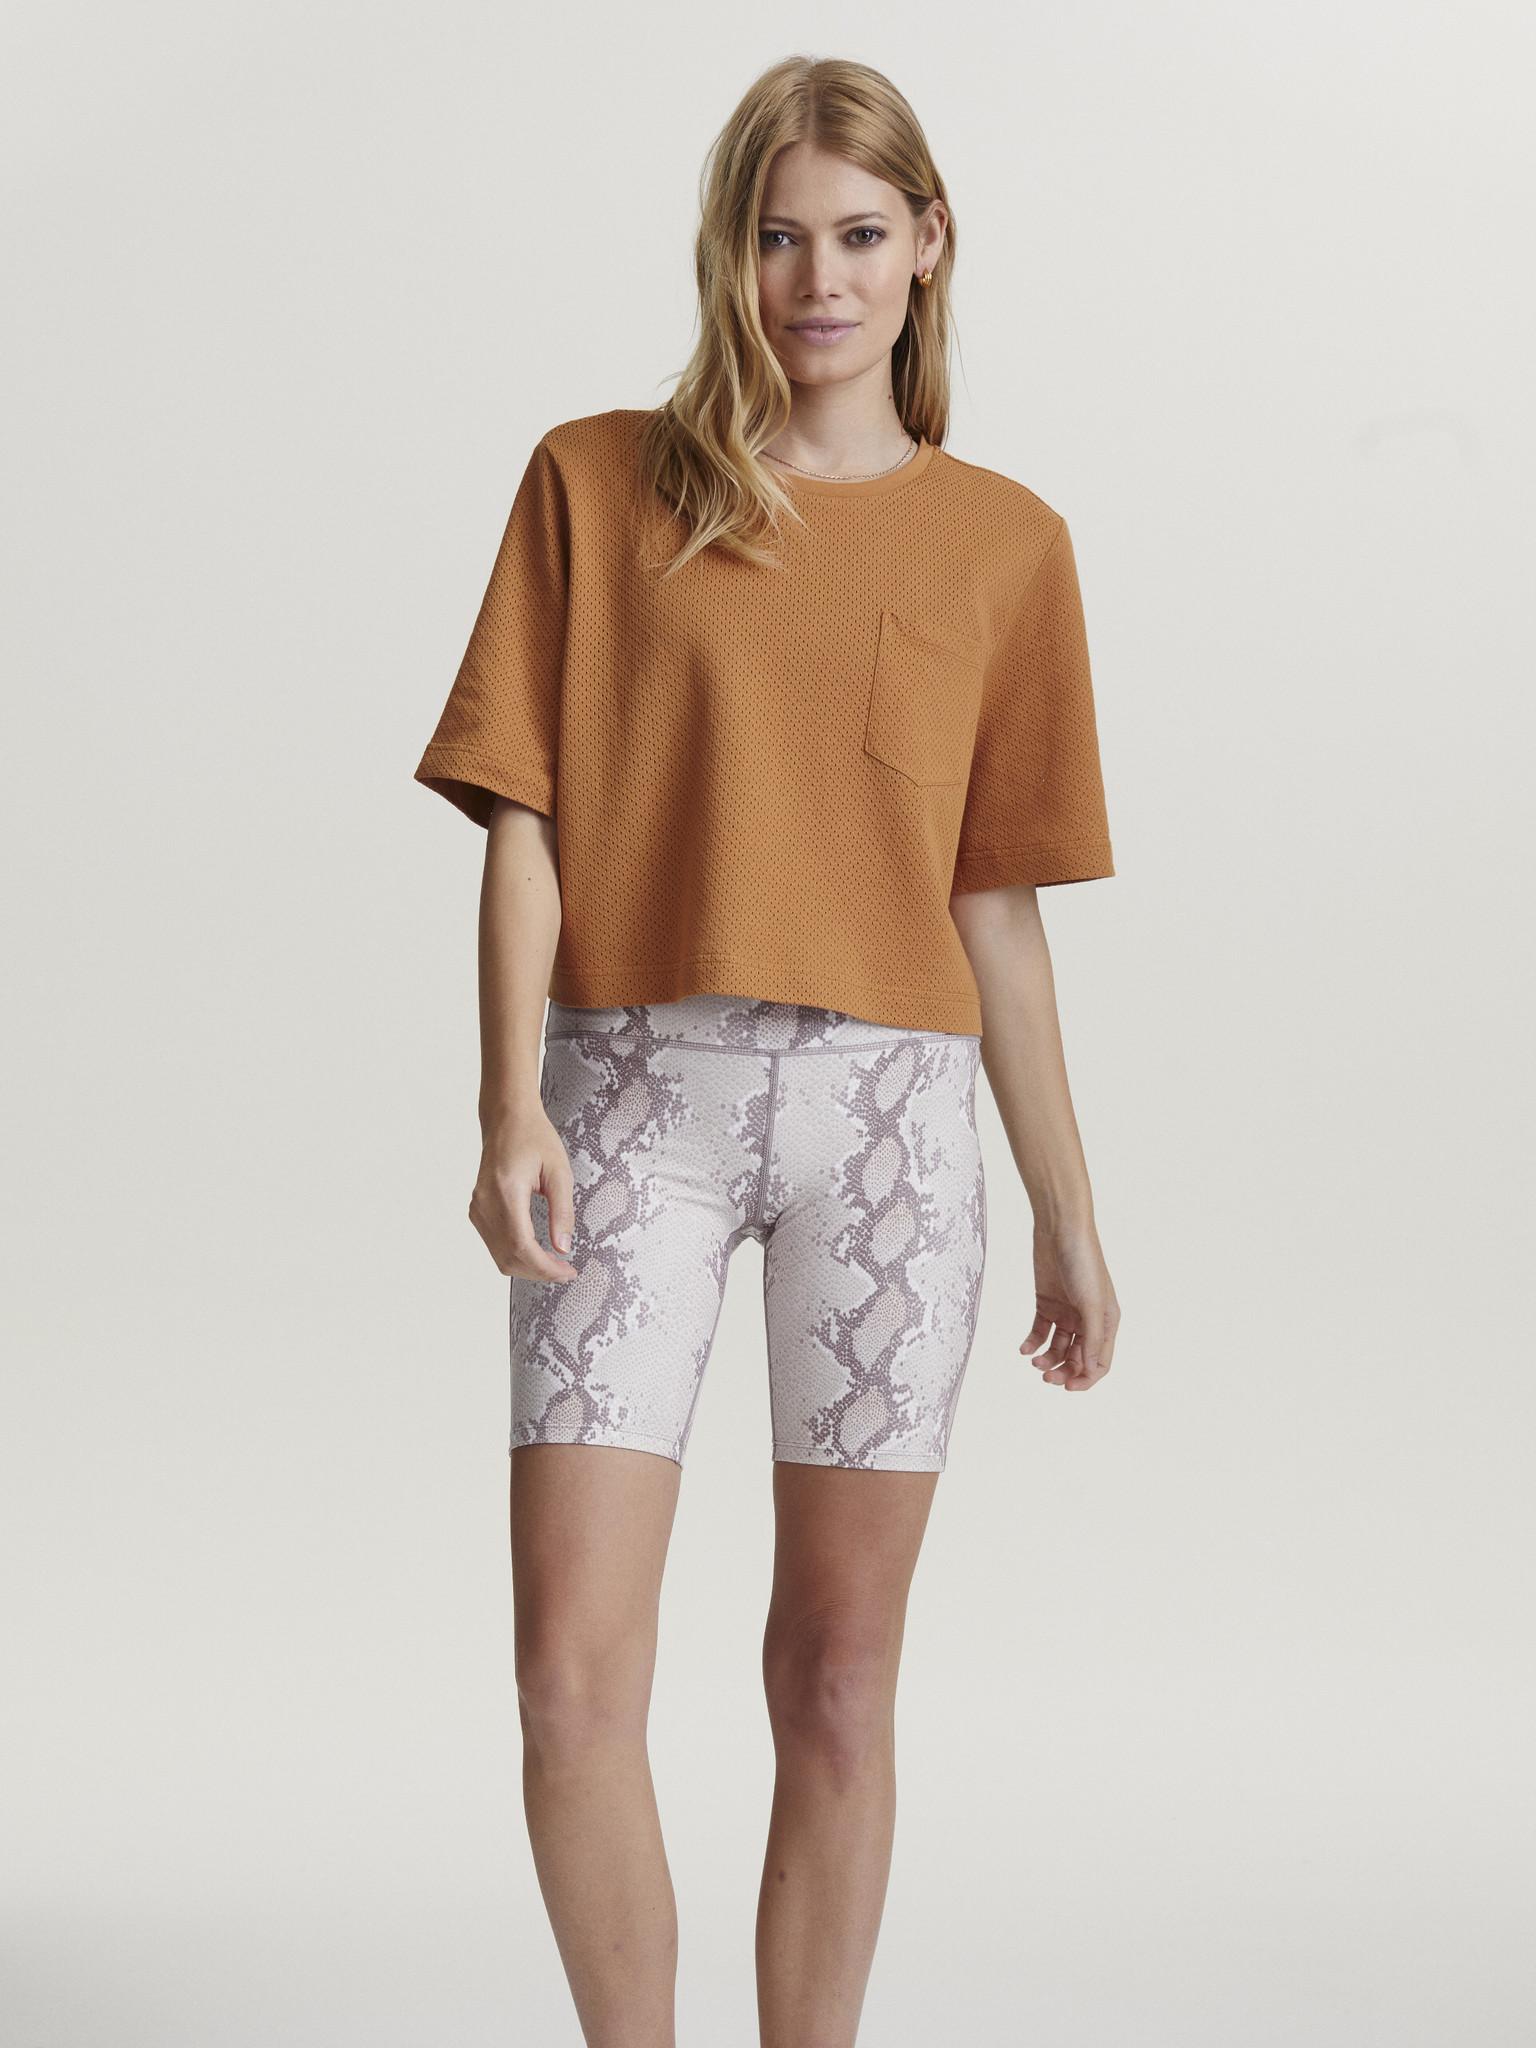 Varley Bexley T-Shirt Cashew